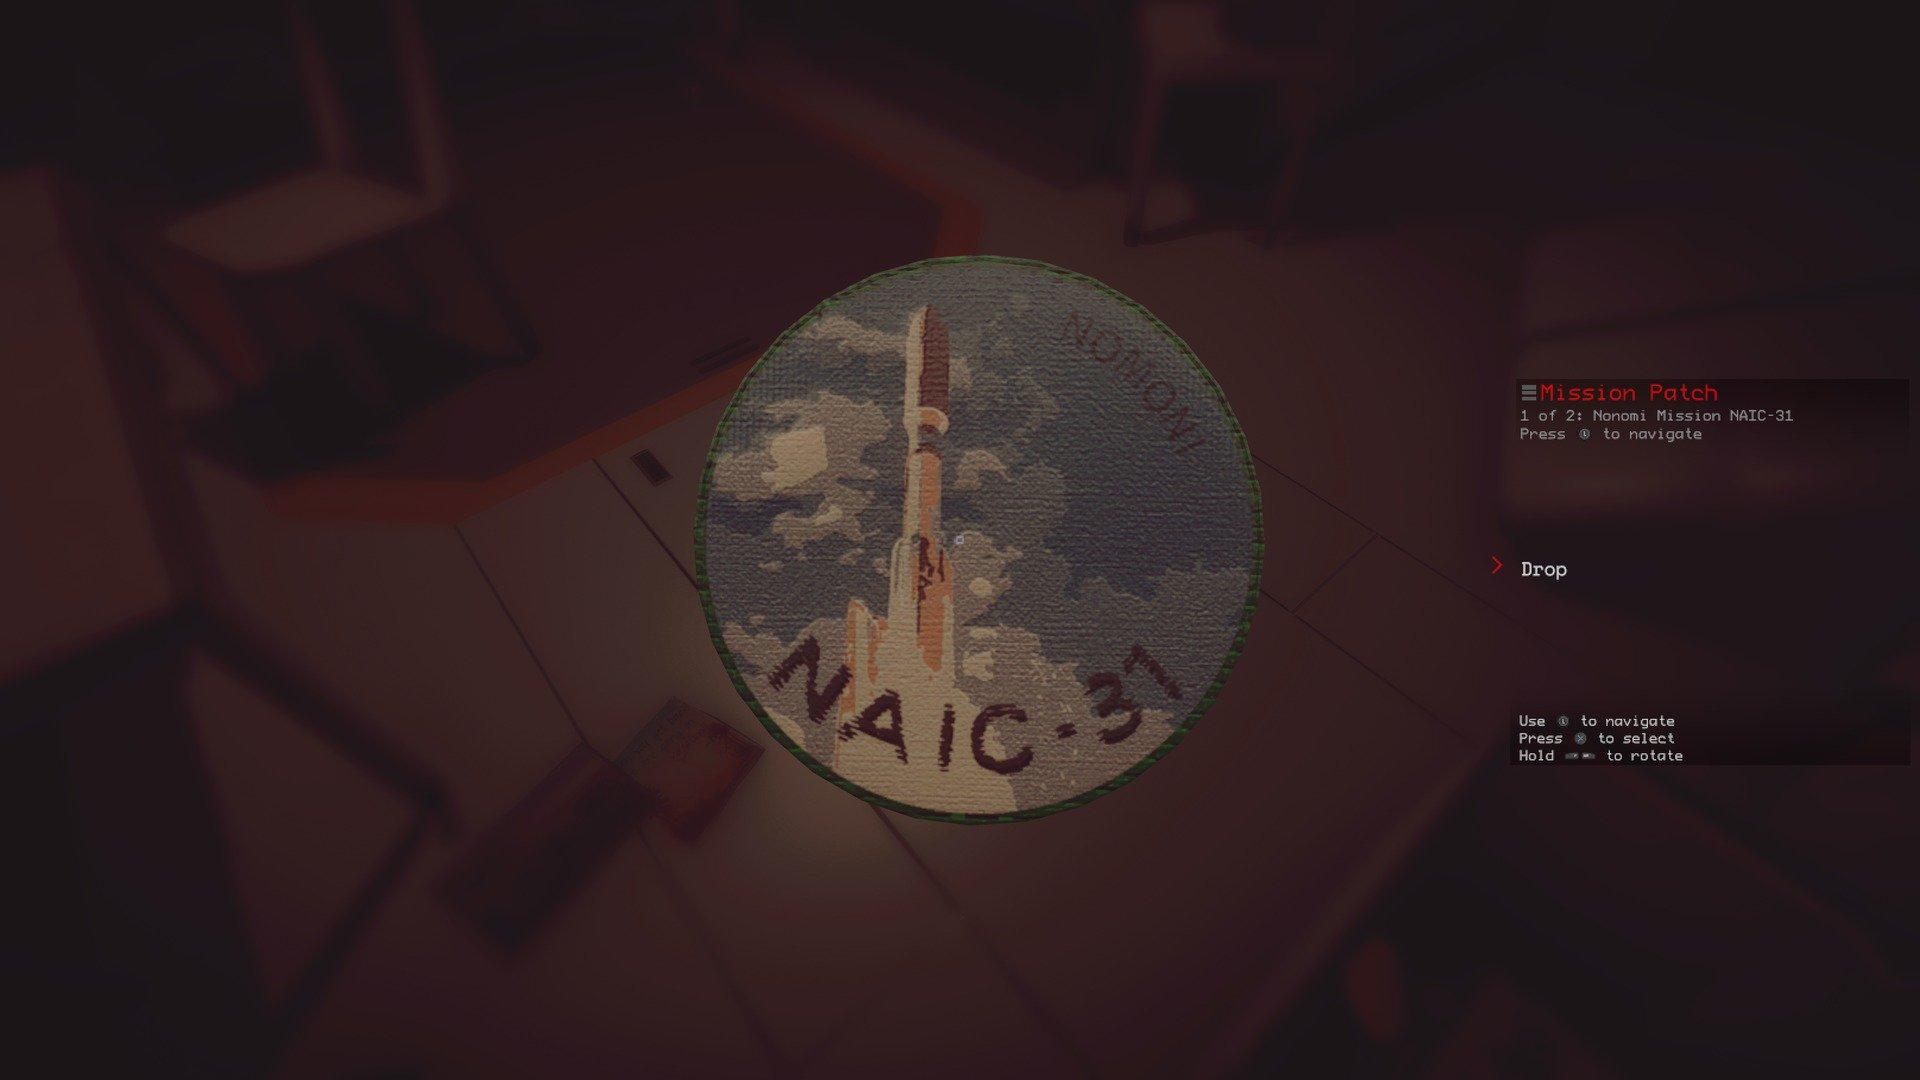 Naic-31 Patch